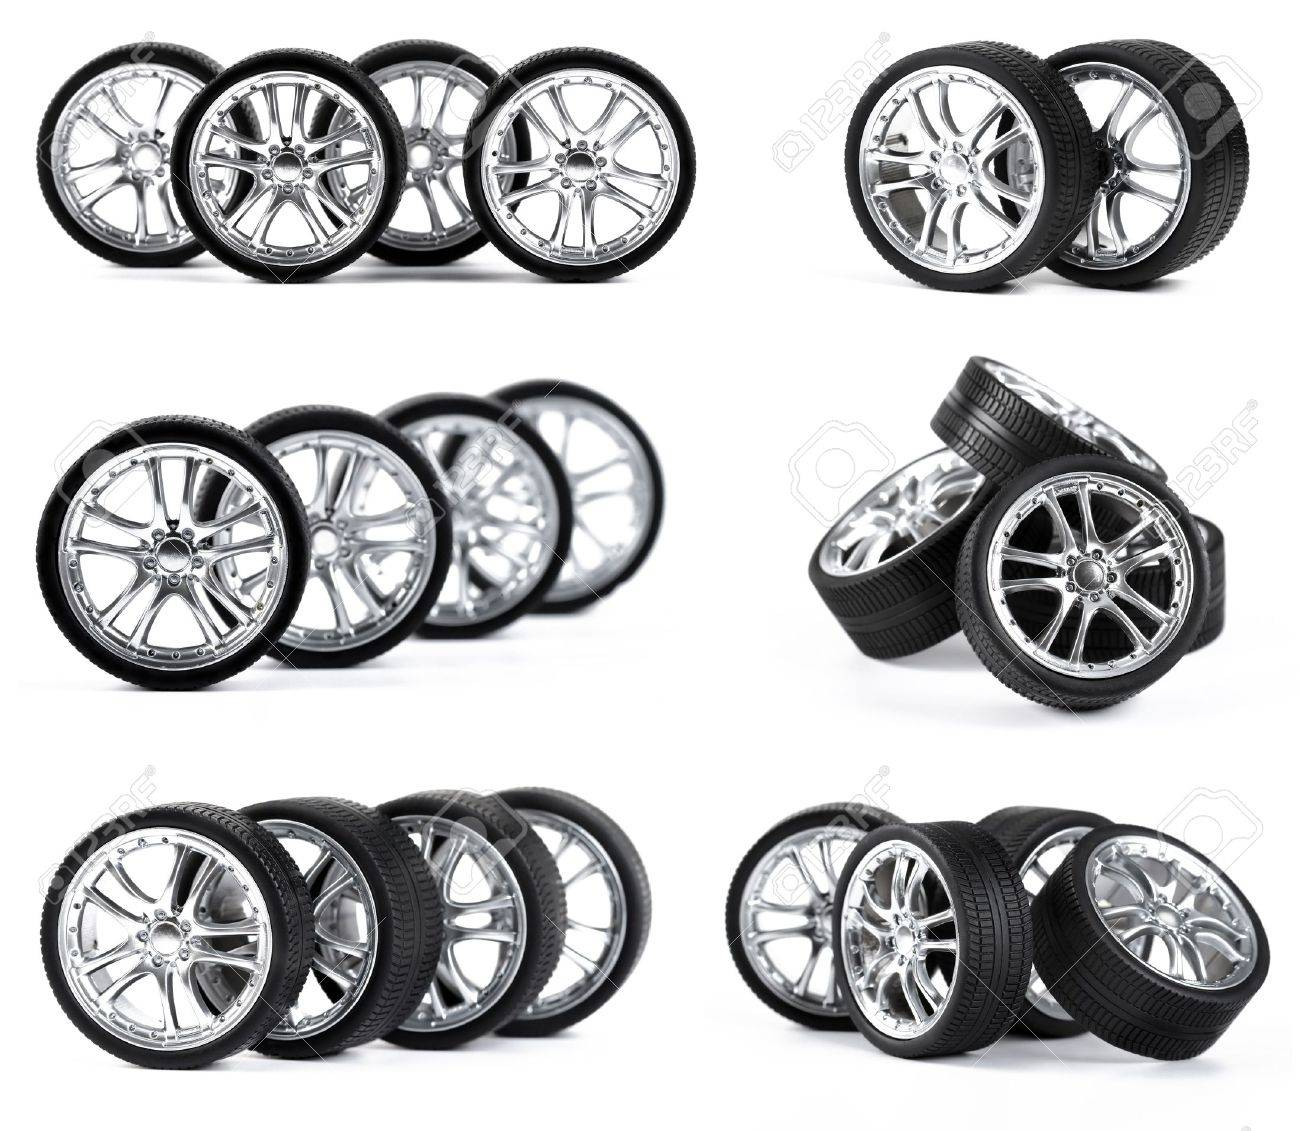 Car wheels on white background. - 11065617